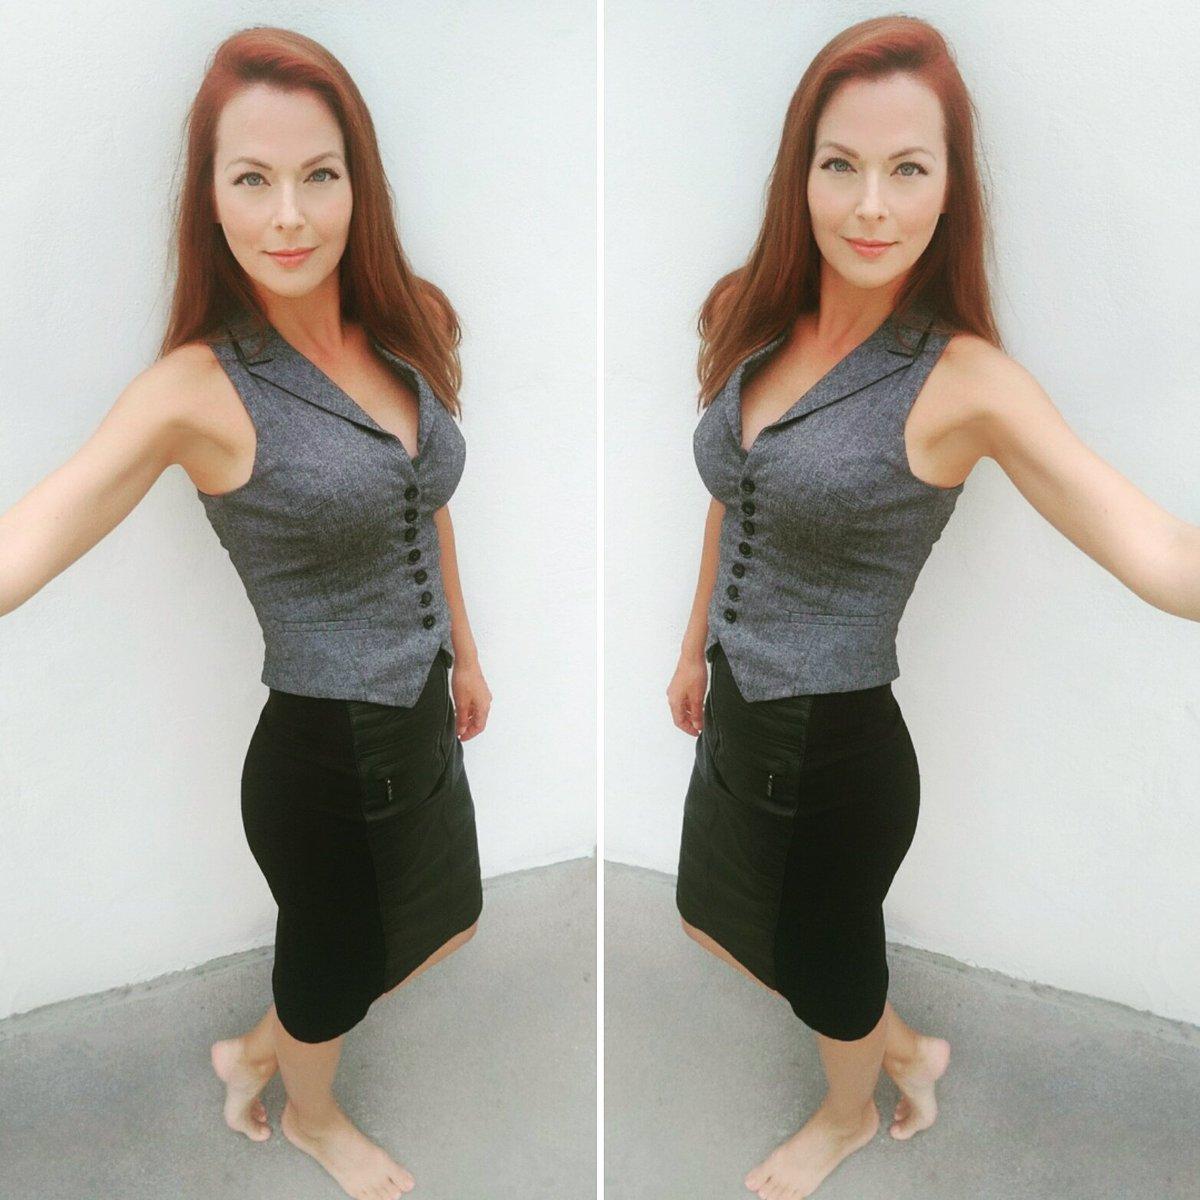 Ann Casson,Bella Hadid USA 3 2016?resent Hot photo Blanche Sweet,Femi Benussi (born 1945 (born in Rovinj in modern Croatia